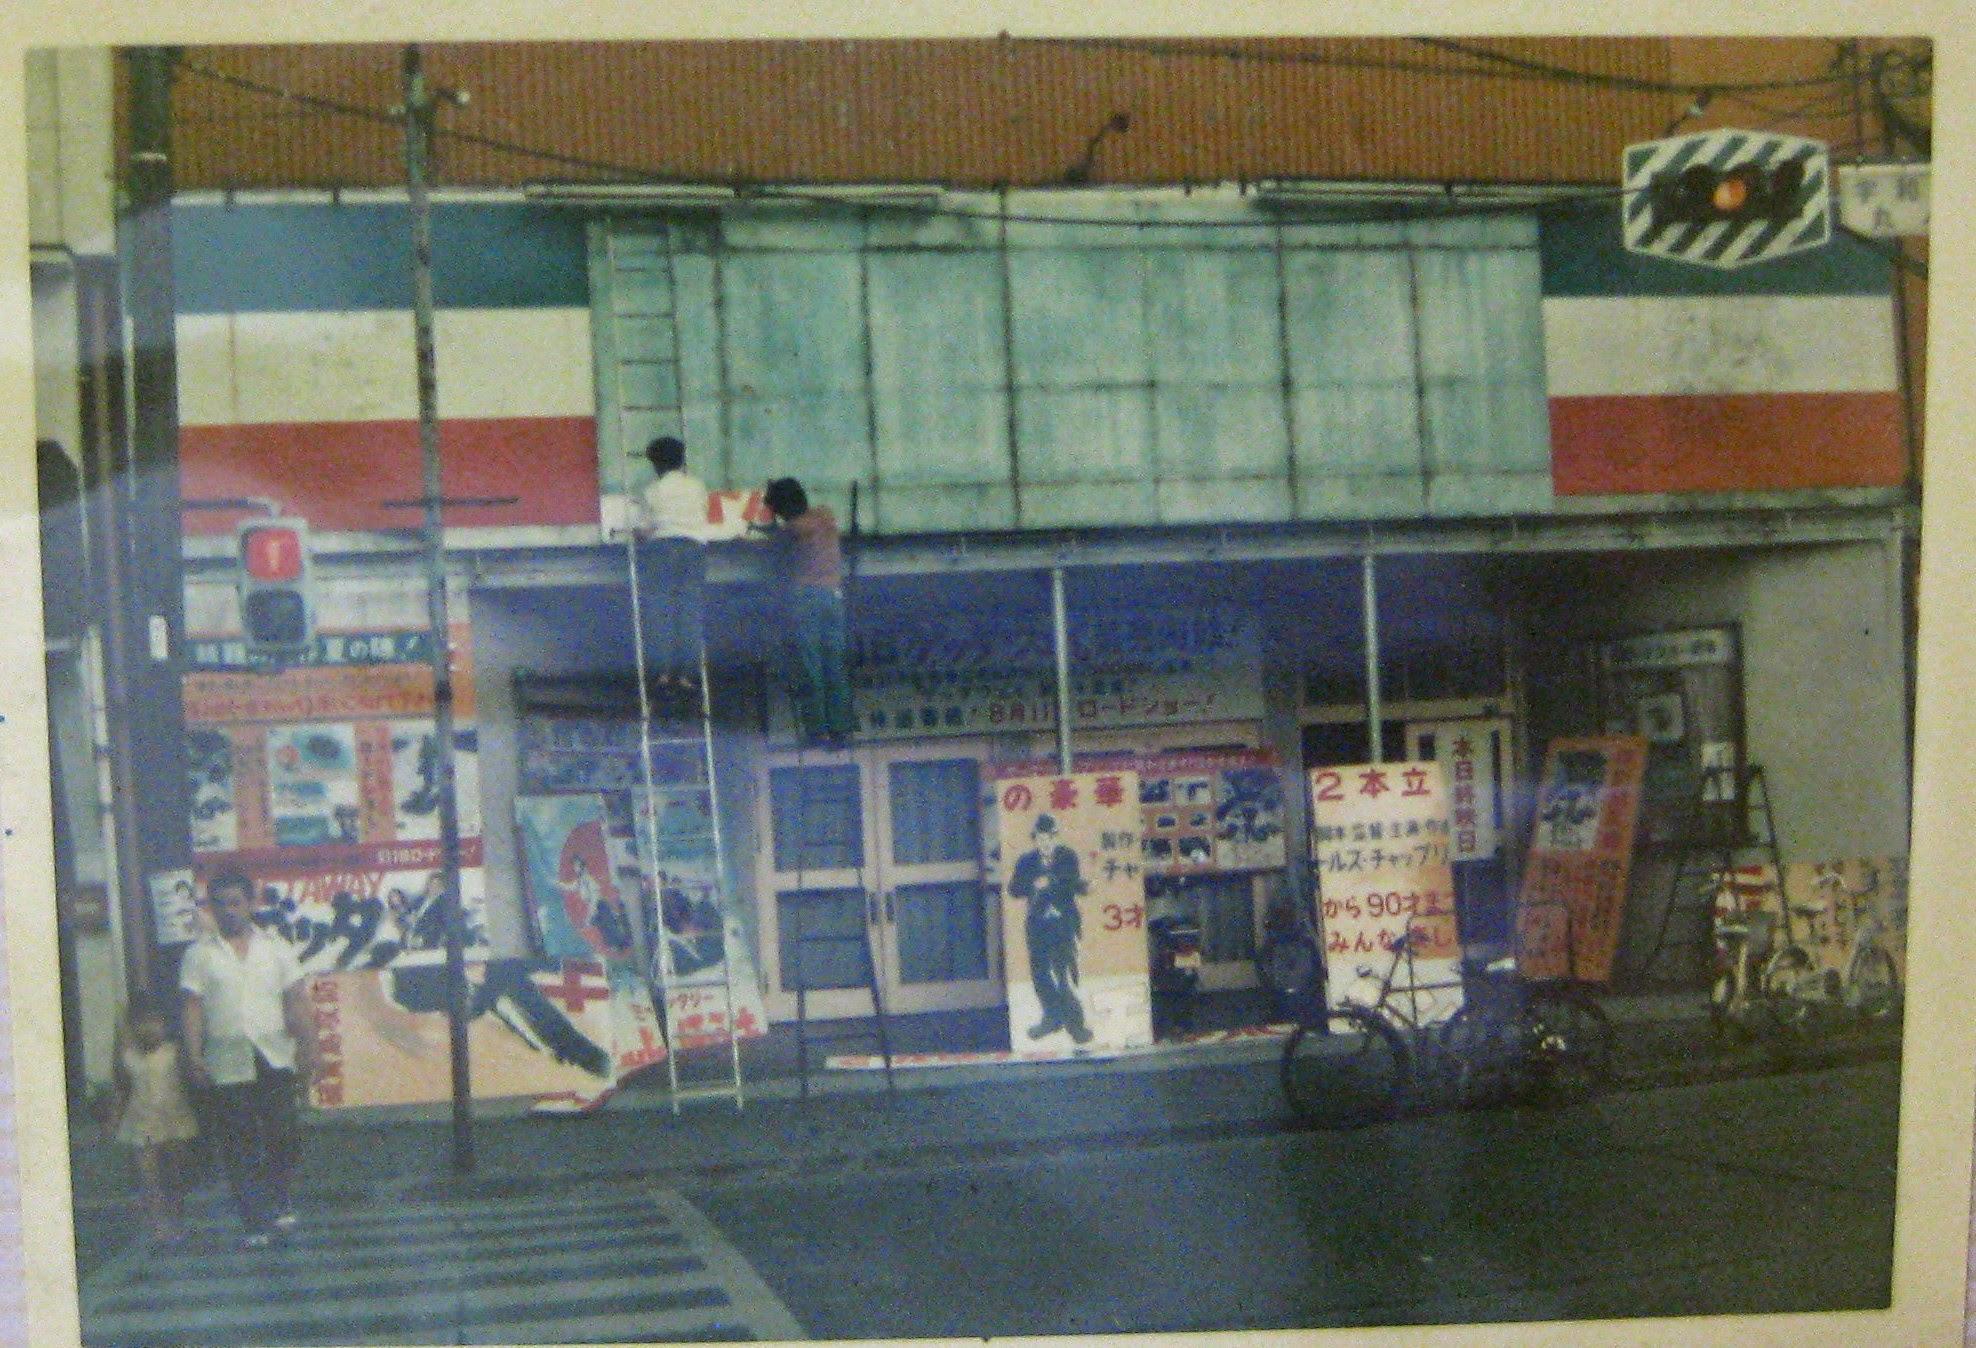 Photo: 『旅の重さ』(1972)  http://inagara.octsky.net/tabino-omosa 宇和島の映画館(参考)撮影は1973年。 ©1973 赤松幸吉